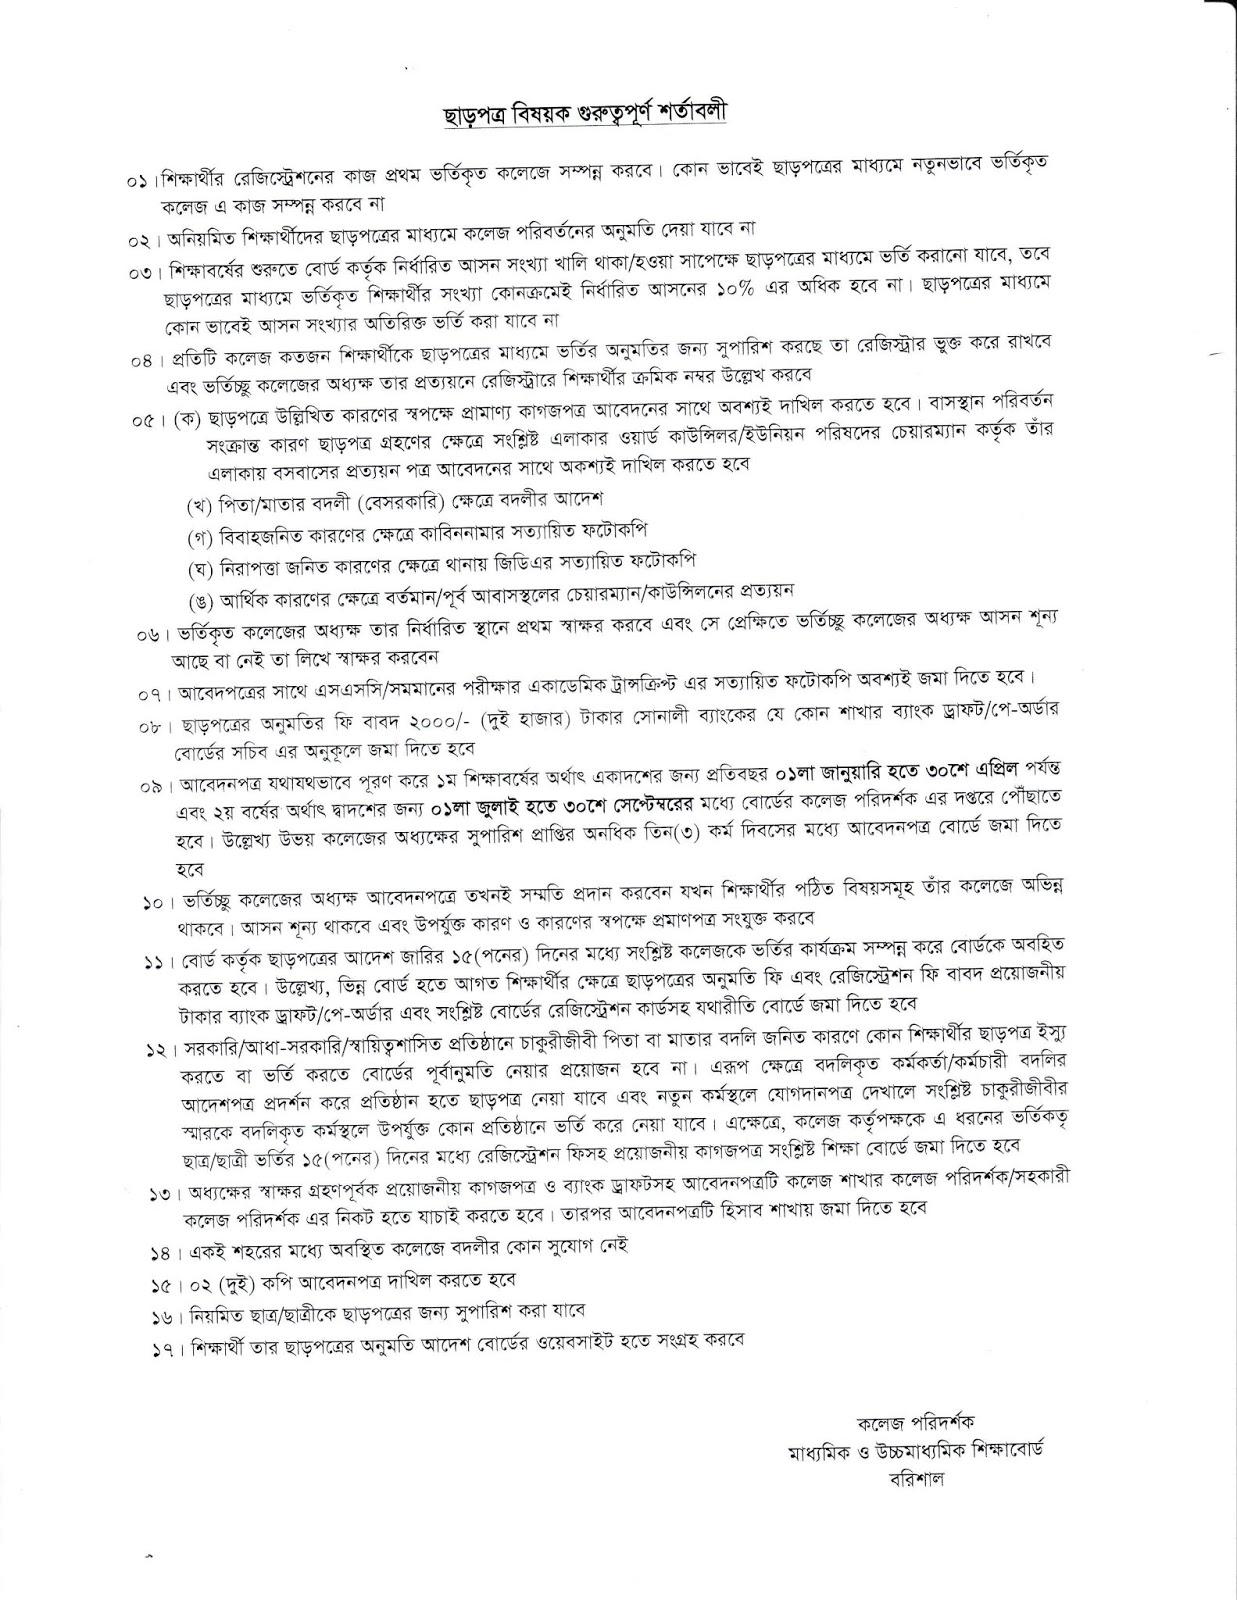 Barisal Board HSC College Transfer Form (TC) 2019